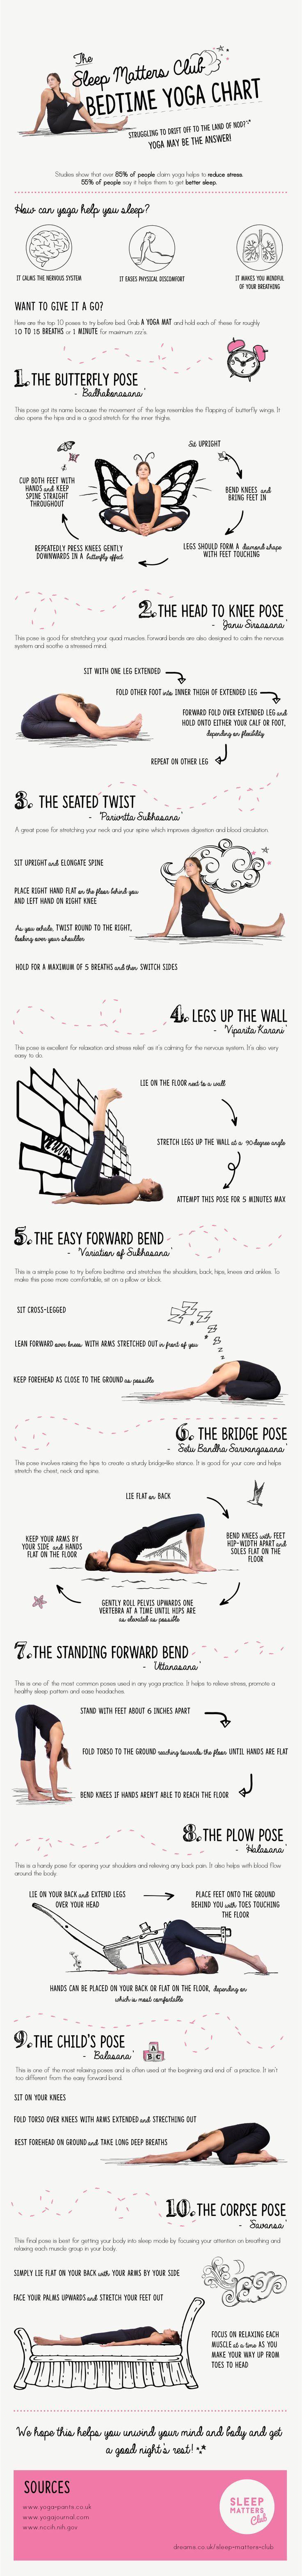 10 Step Relaxing Bedtime Yoga Routine Kim Long Bedtime Kim Long Relaxing Routine Step Yoga Bedtime Yoga Yoga Chart Bedtime Yoga Poses